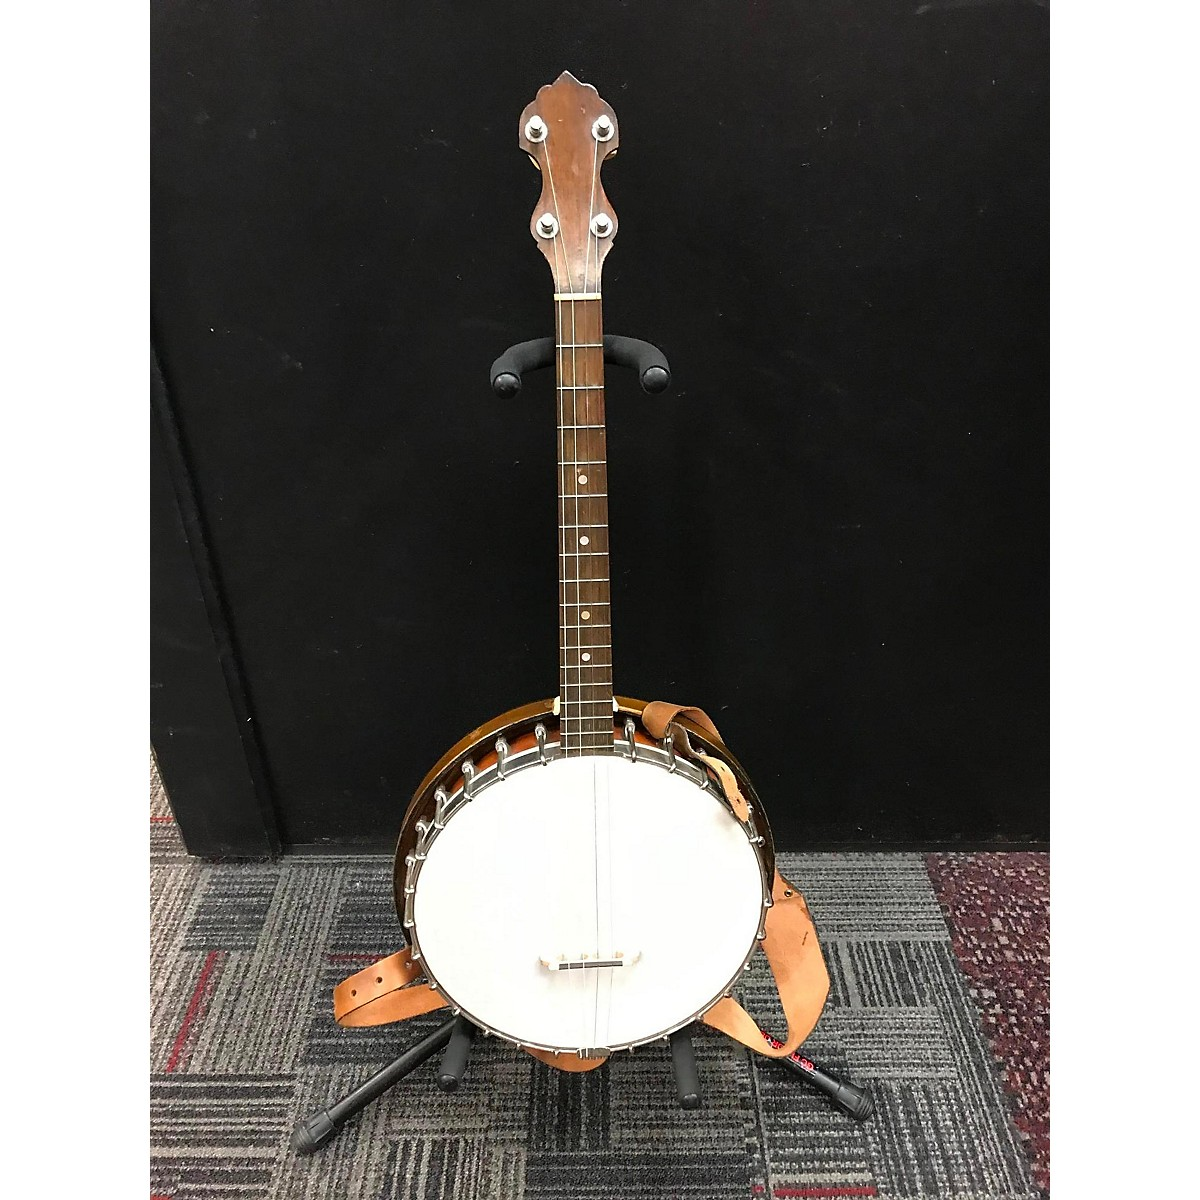 In Store Vintage Vintage 1930s FAIRBANKS STYLE N Natural Banjo